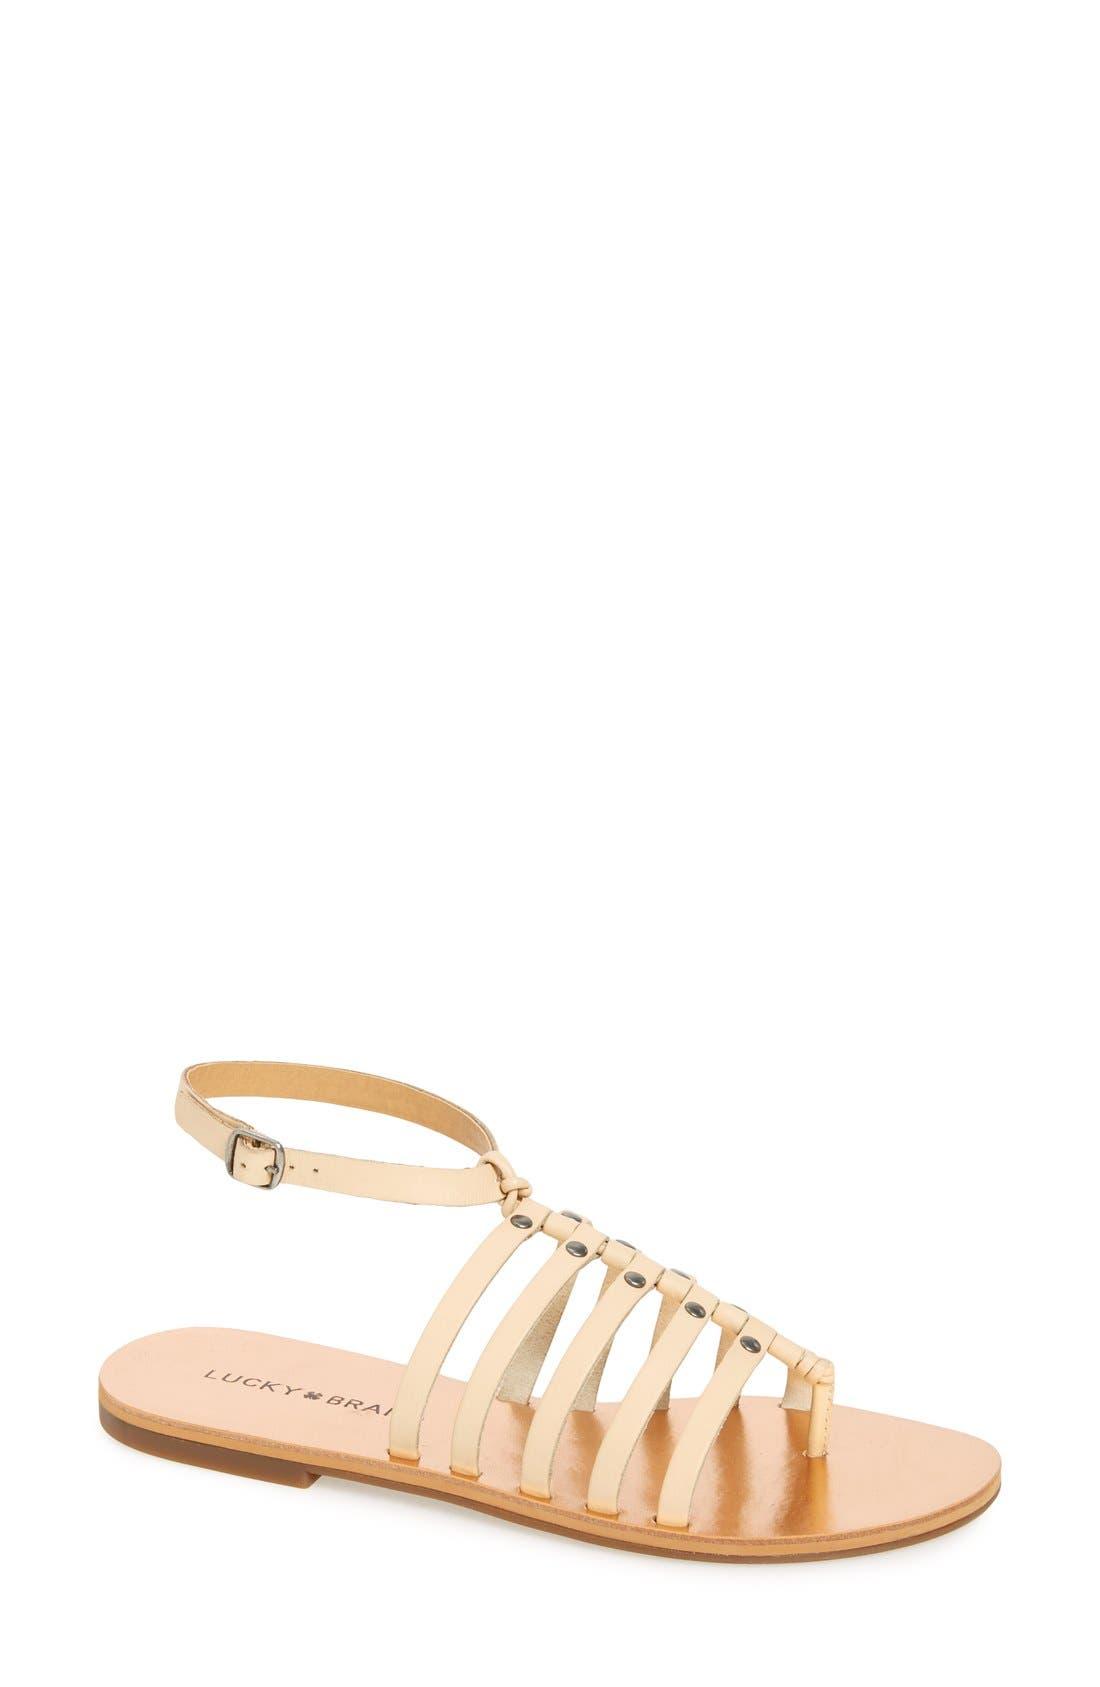 Main Image - Lucky Brand 'Cymaa' Gladiator Sandal (Women)